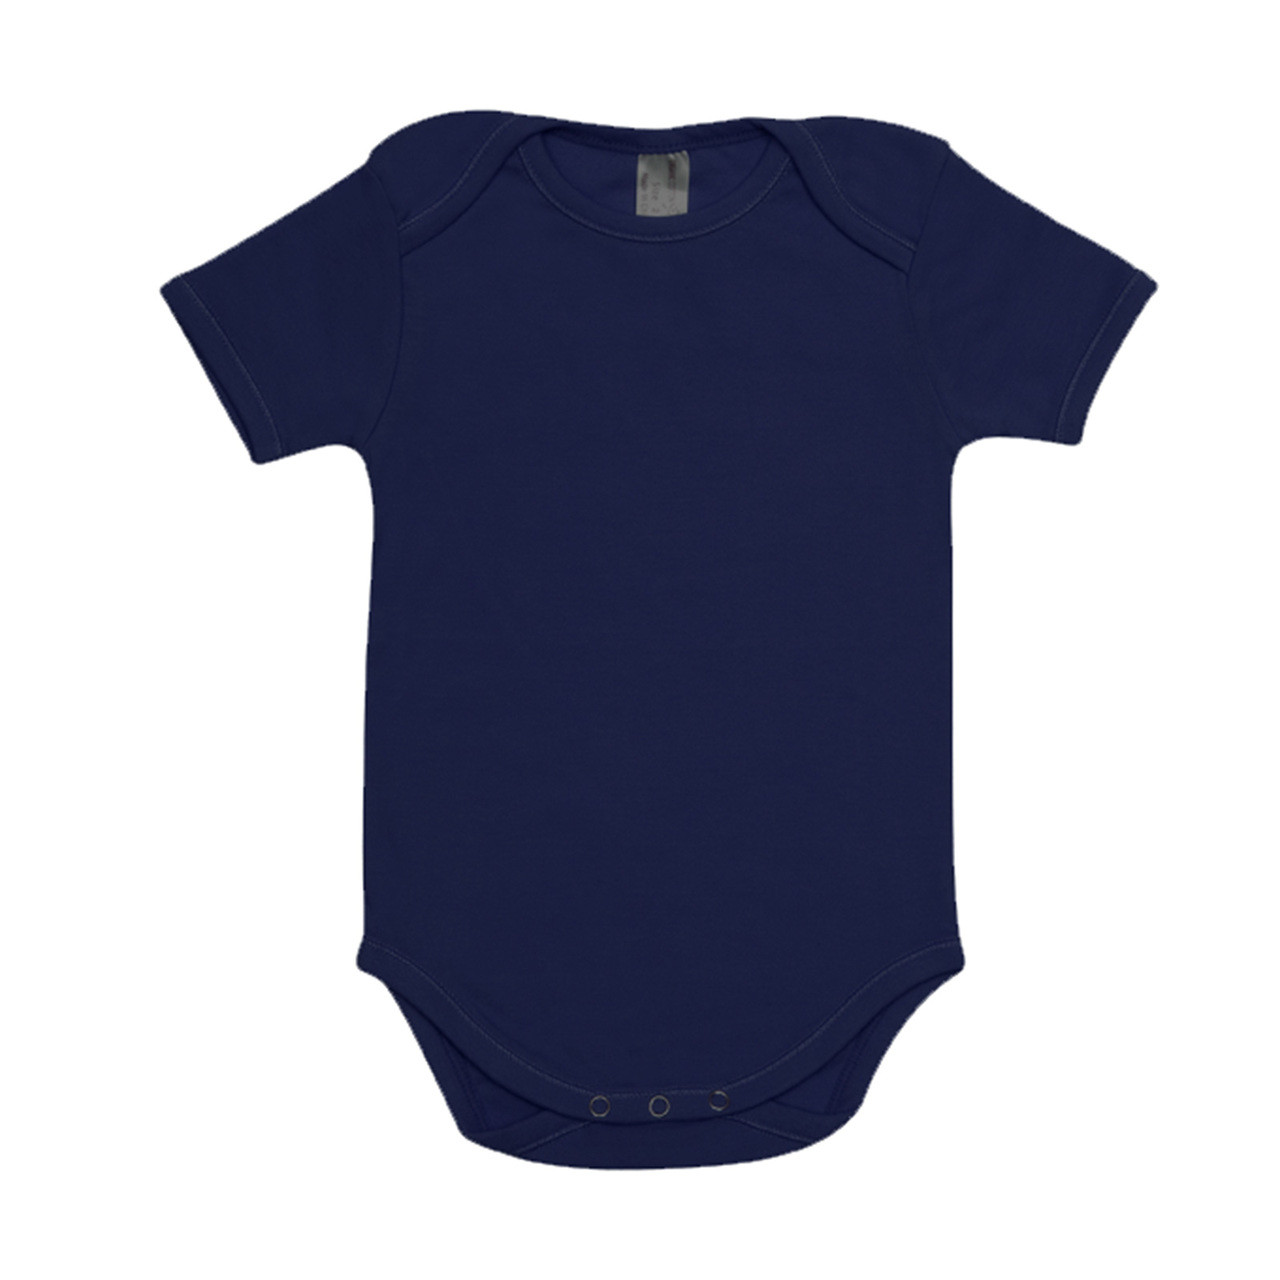 KAI | Baby Rompers Organic Cotton